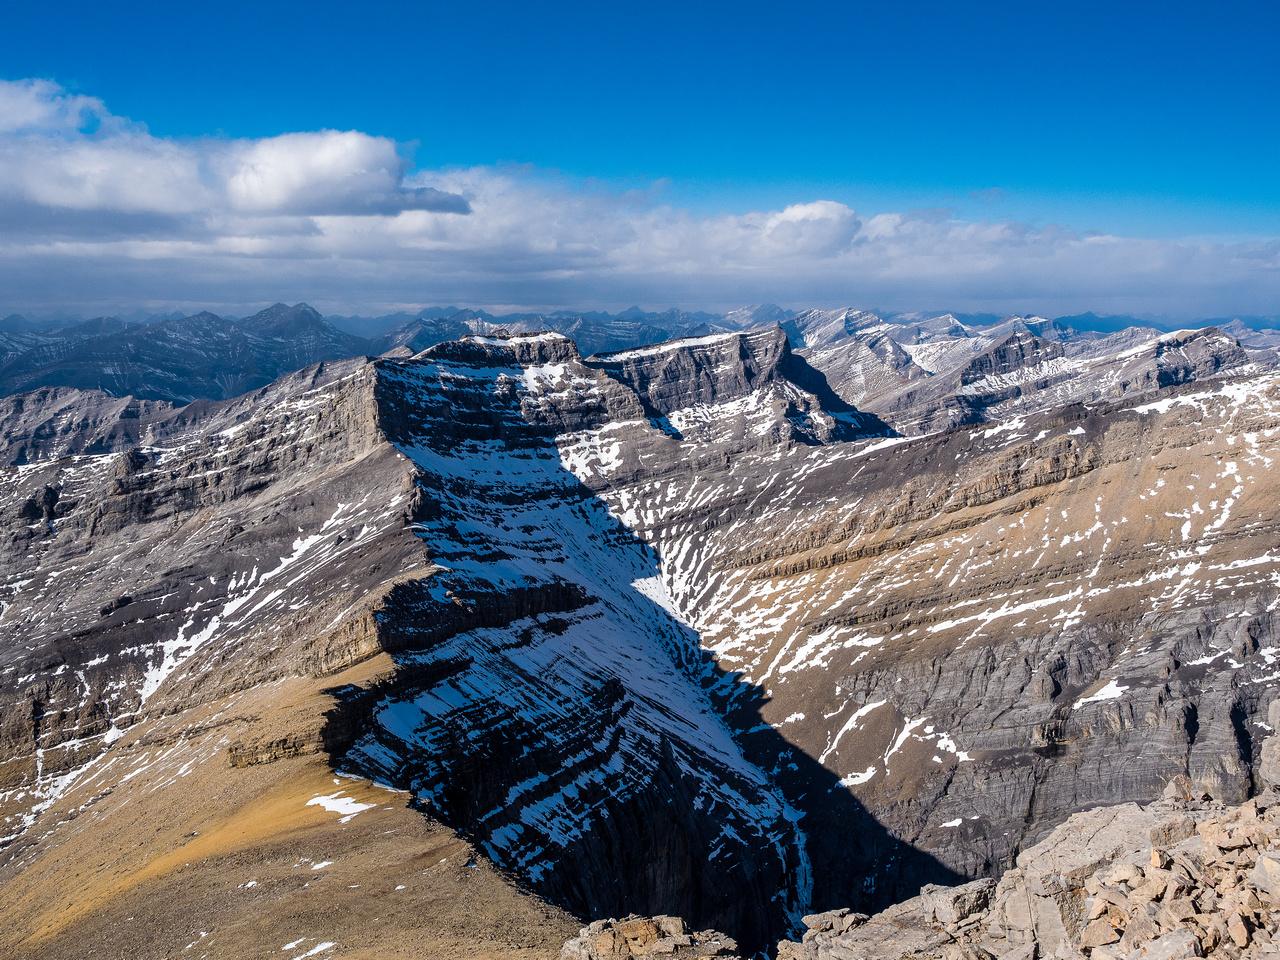 Astral Peak.